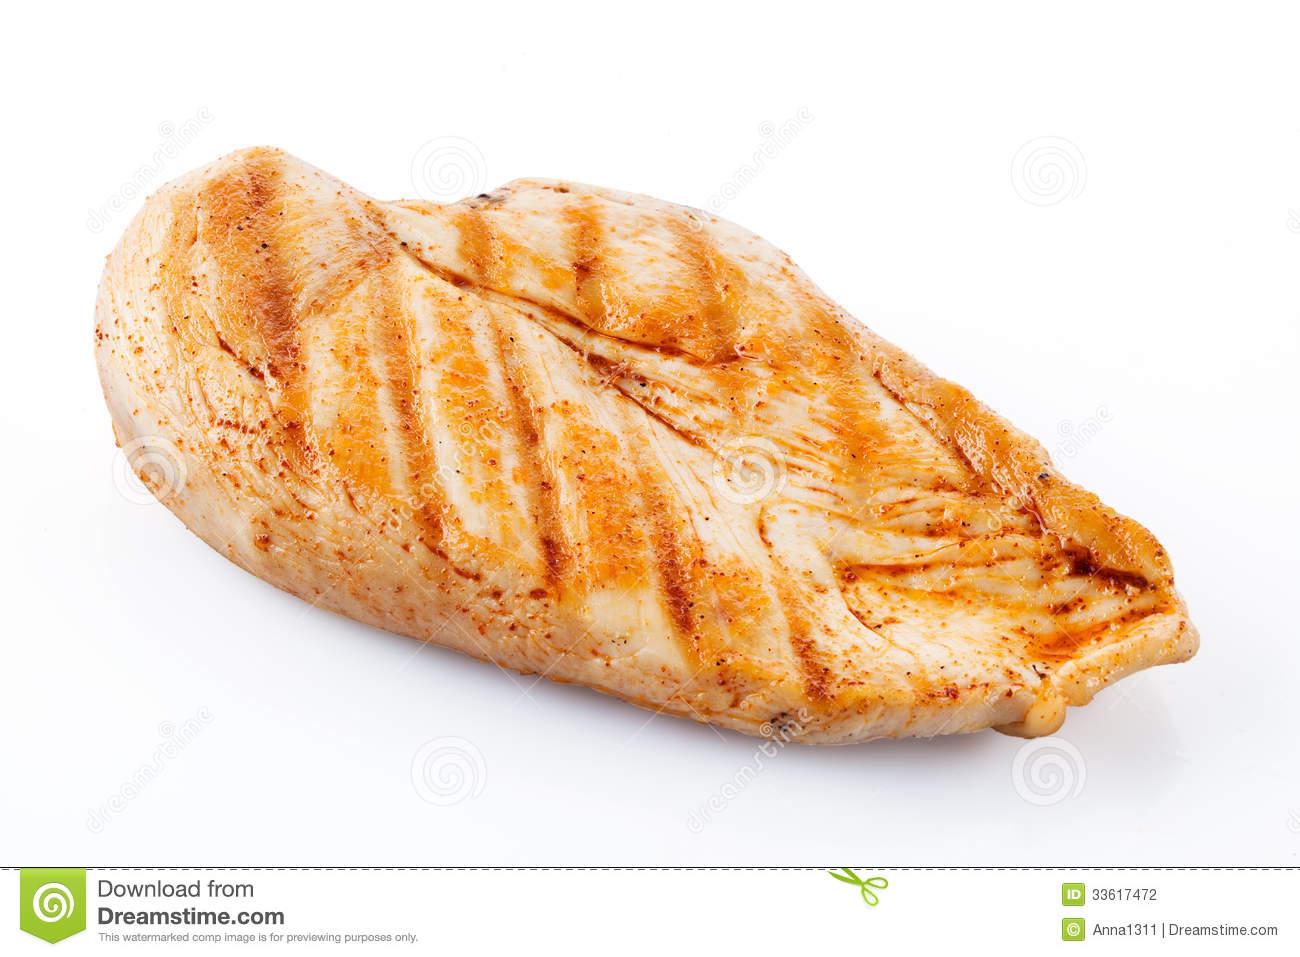 1300x957 15 Cooked Clipart Chicken Fillet For Free Download On Mbtskoudsalg